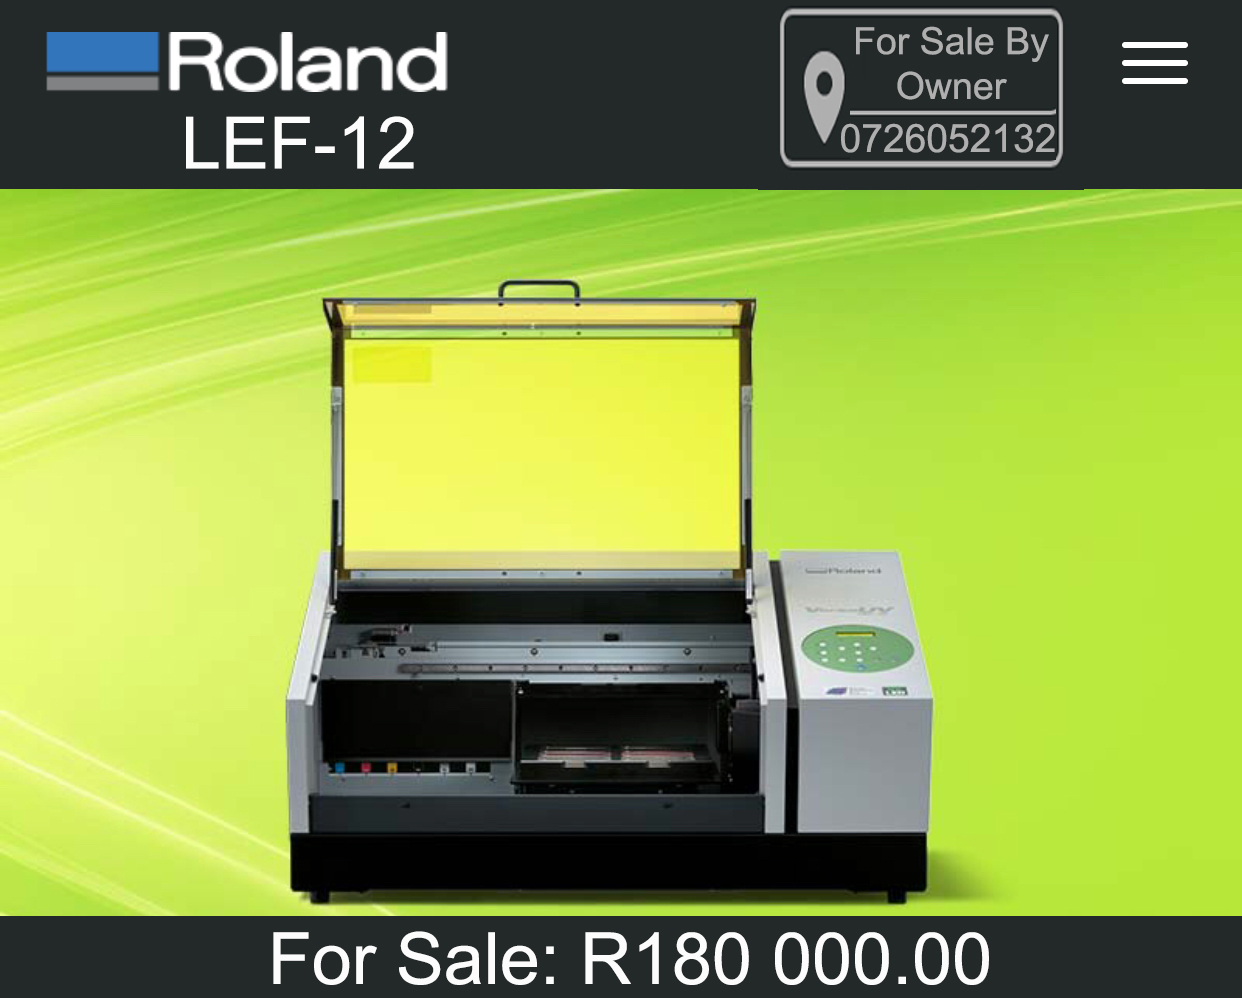 Refurbished Roland LEF-12 UV Printer for Sale